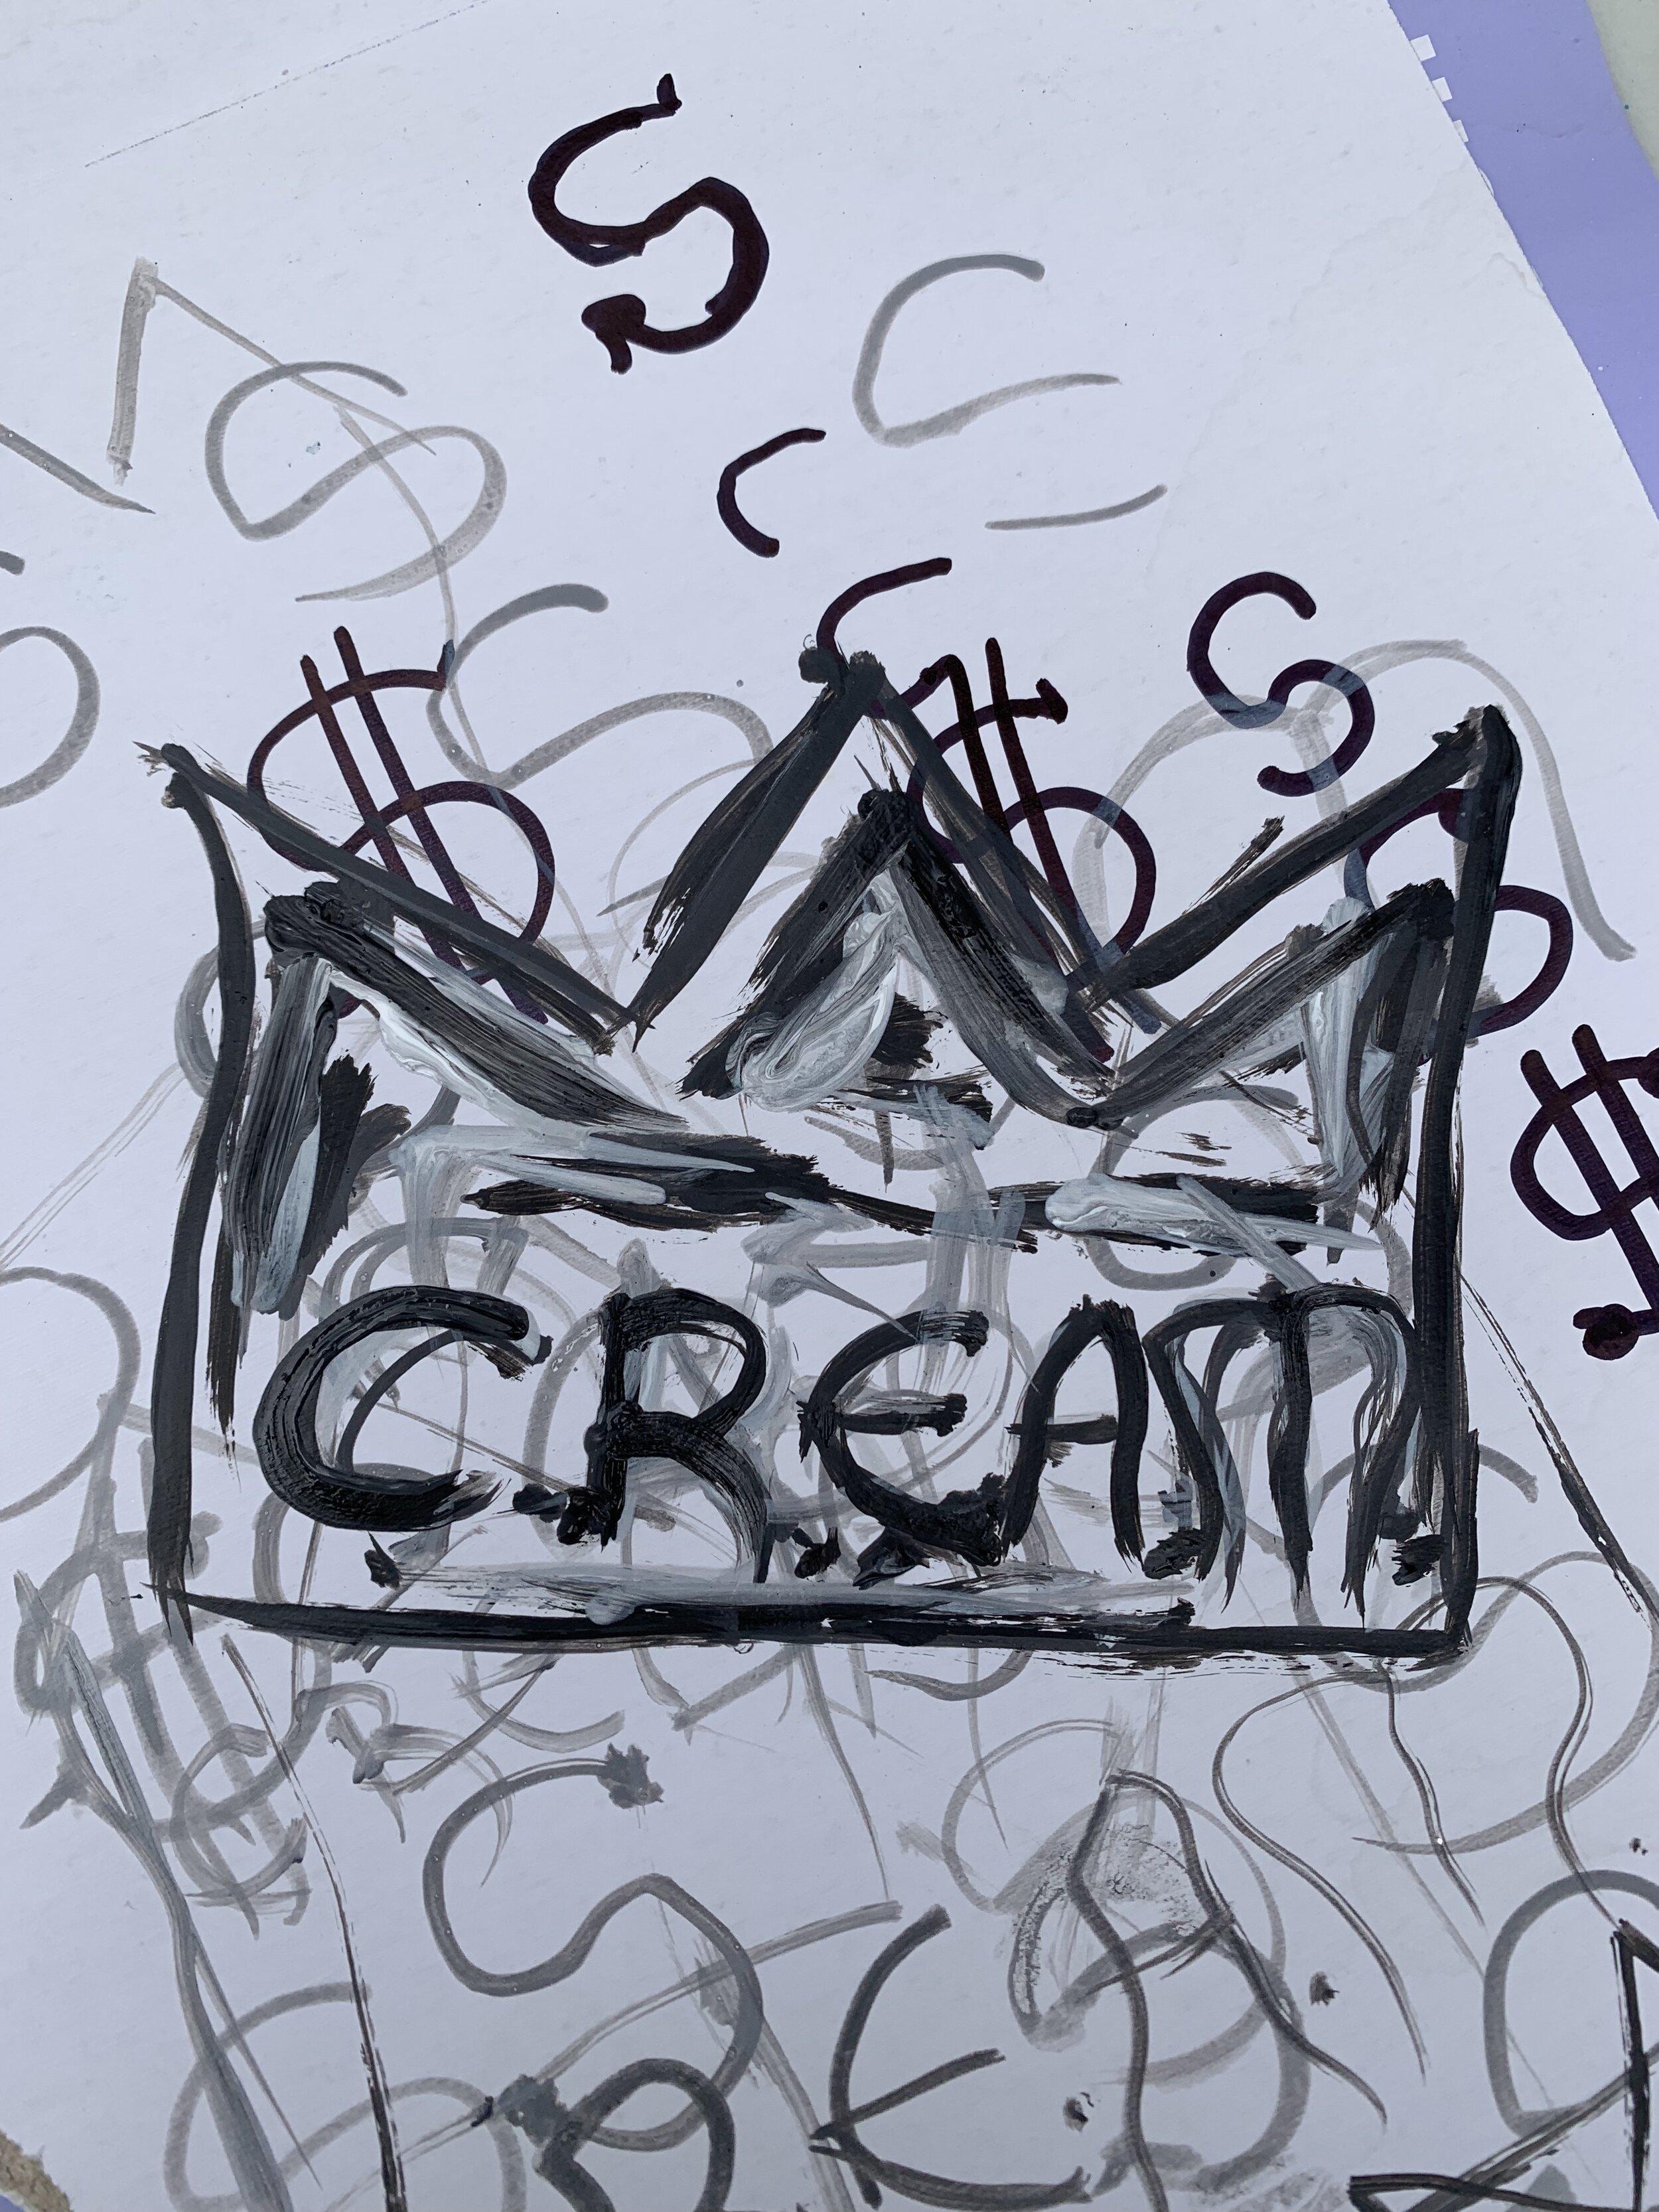 CREAM BASQUIAT SKETCH PRCTC.jpg